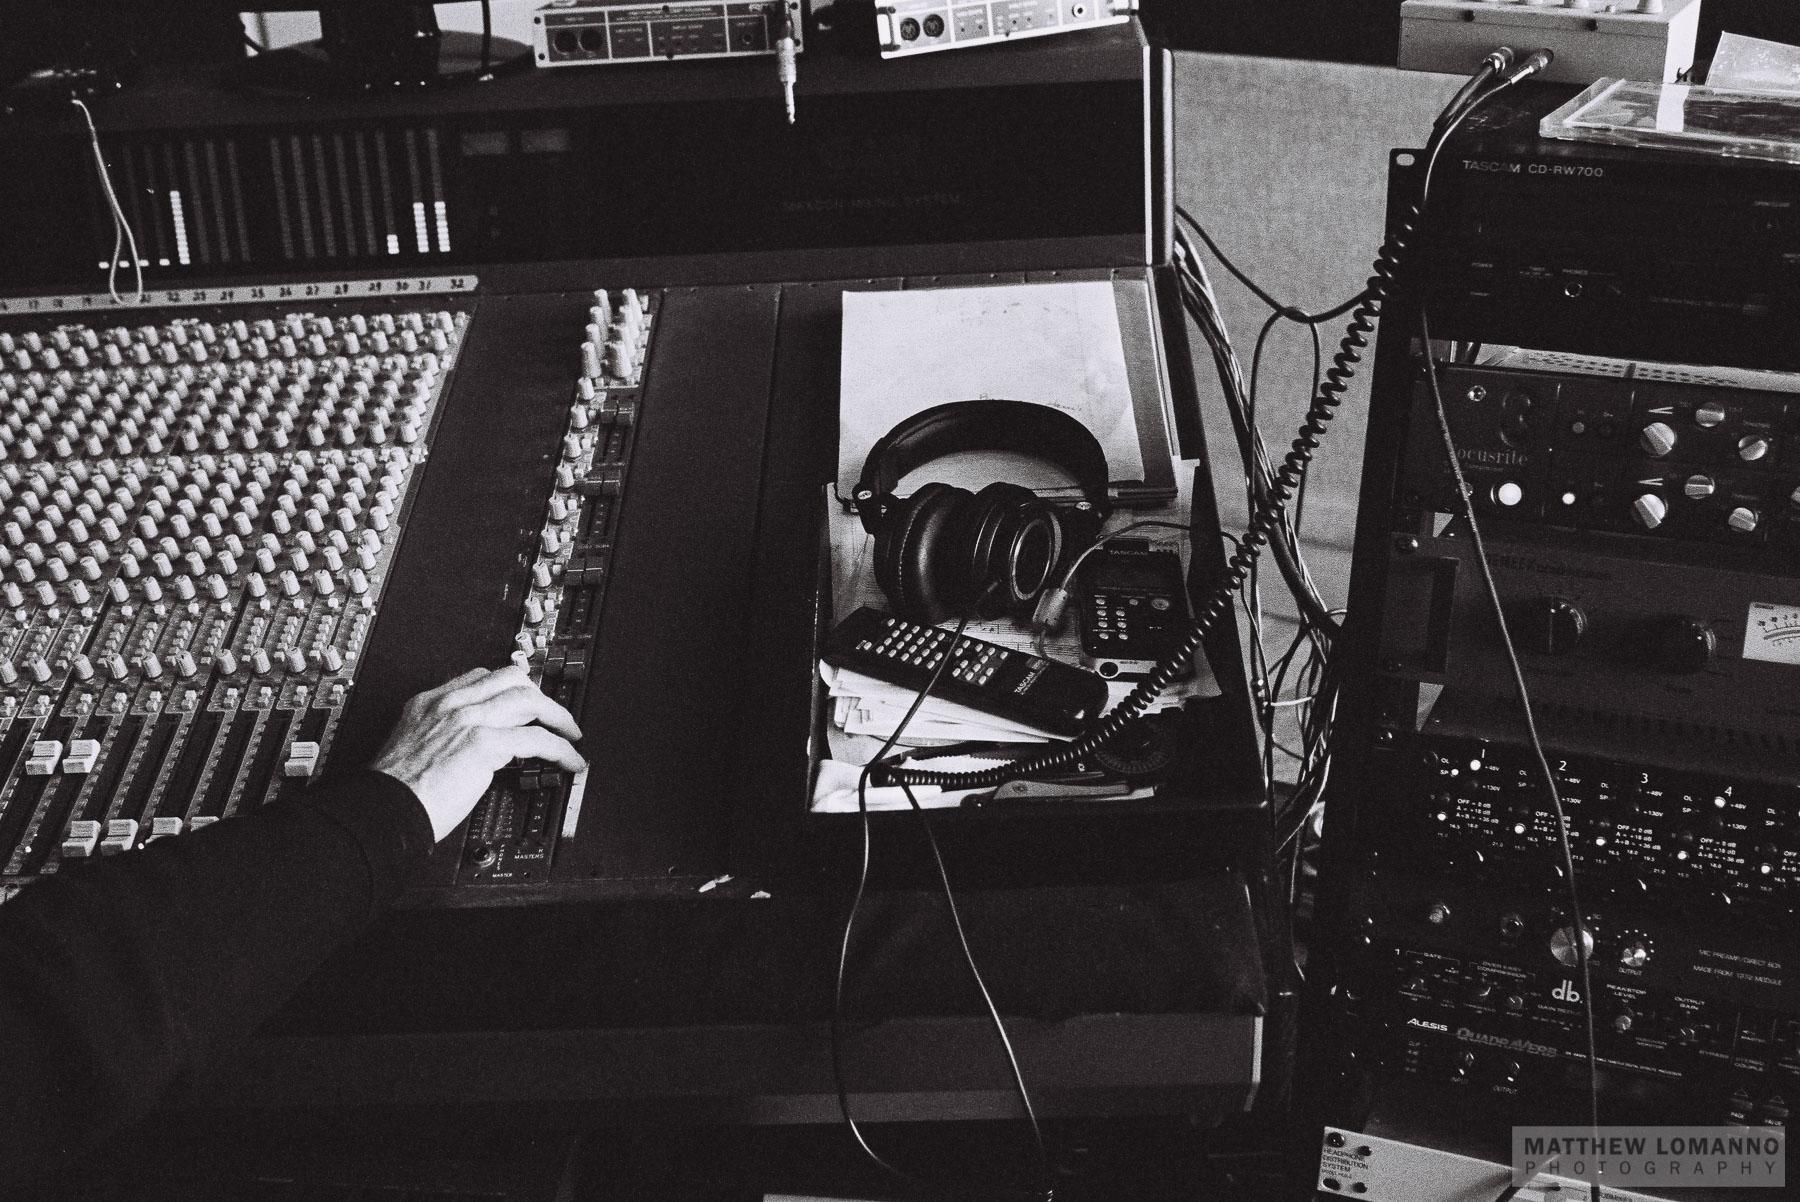 MillPondMusicStudio_Portsmouth_2013_by_Lomanno_0001_web.jpg